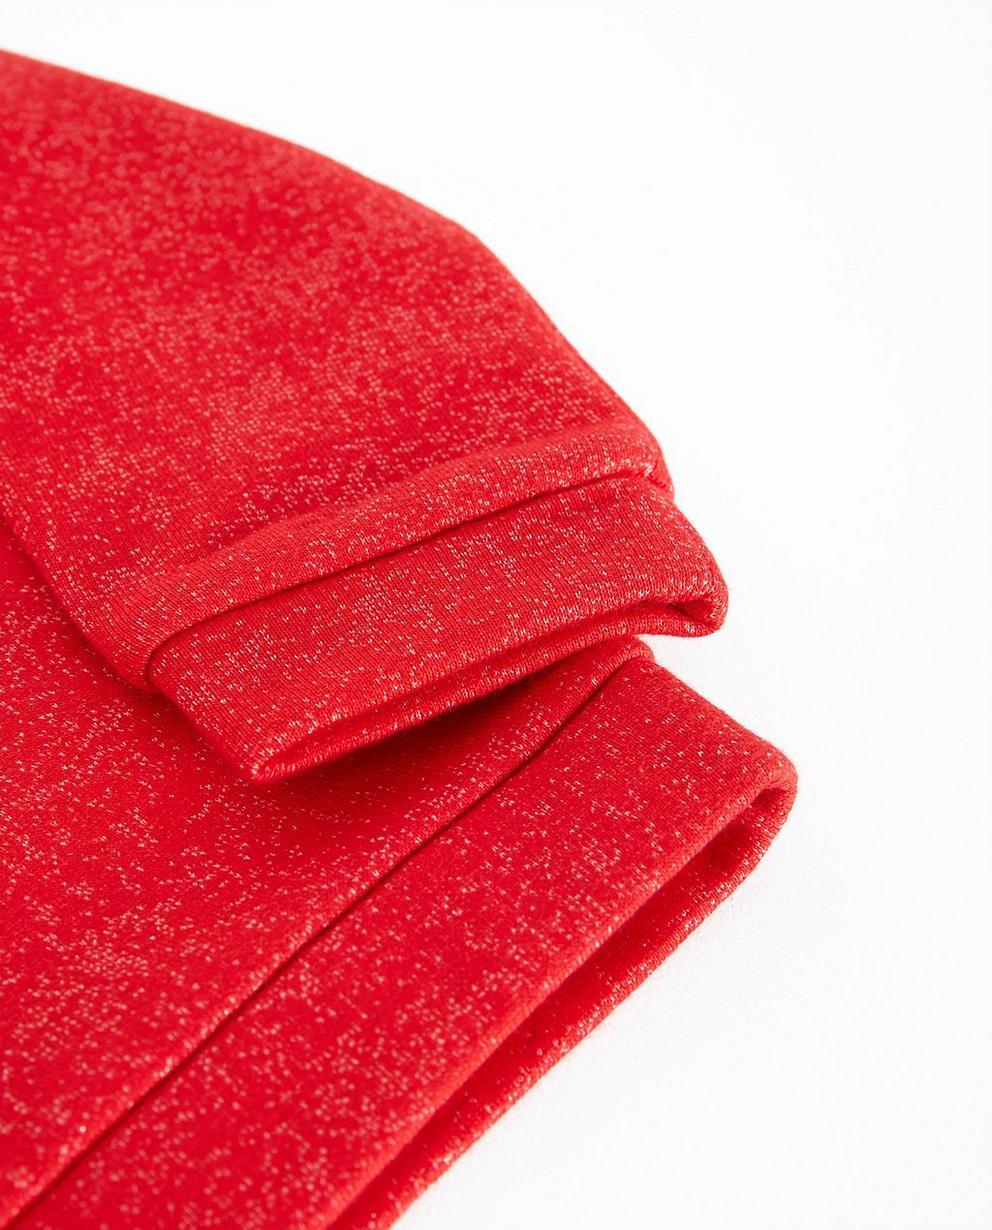 Sweater - Pflaume - Rode sweater met print Samson